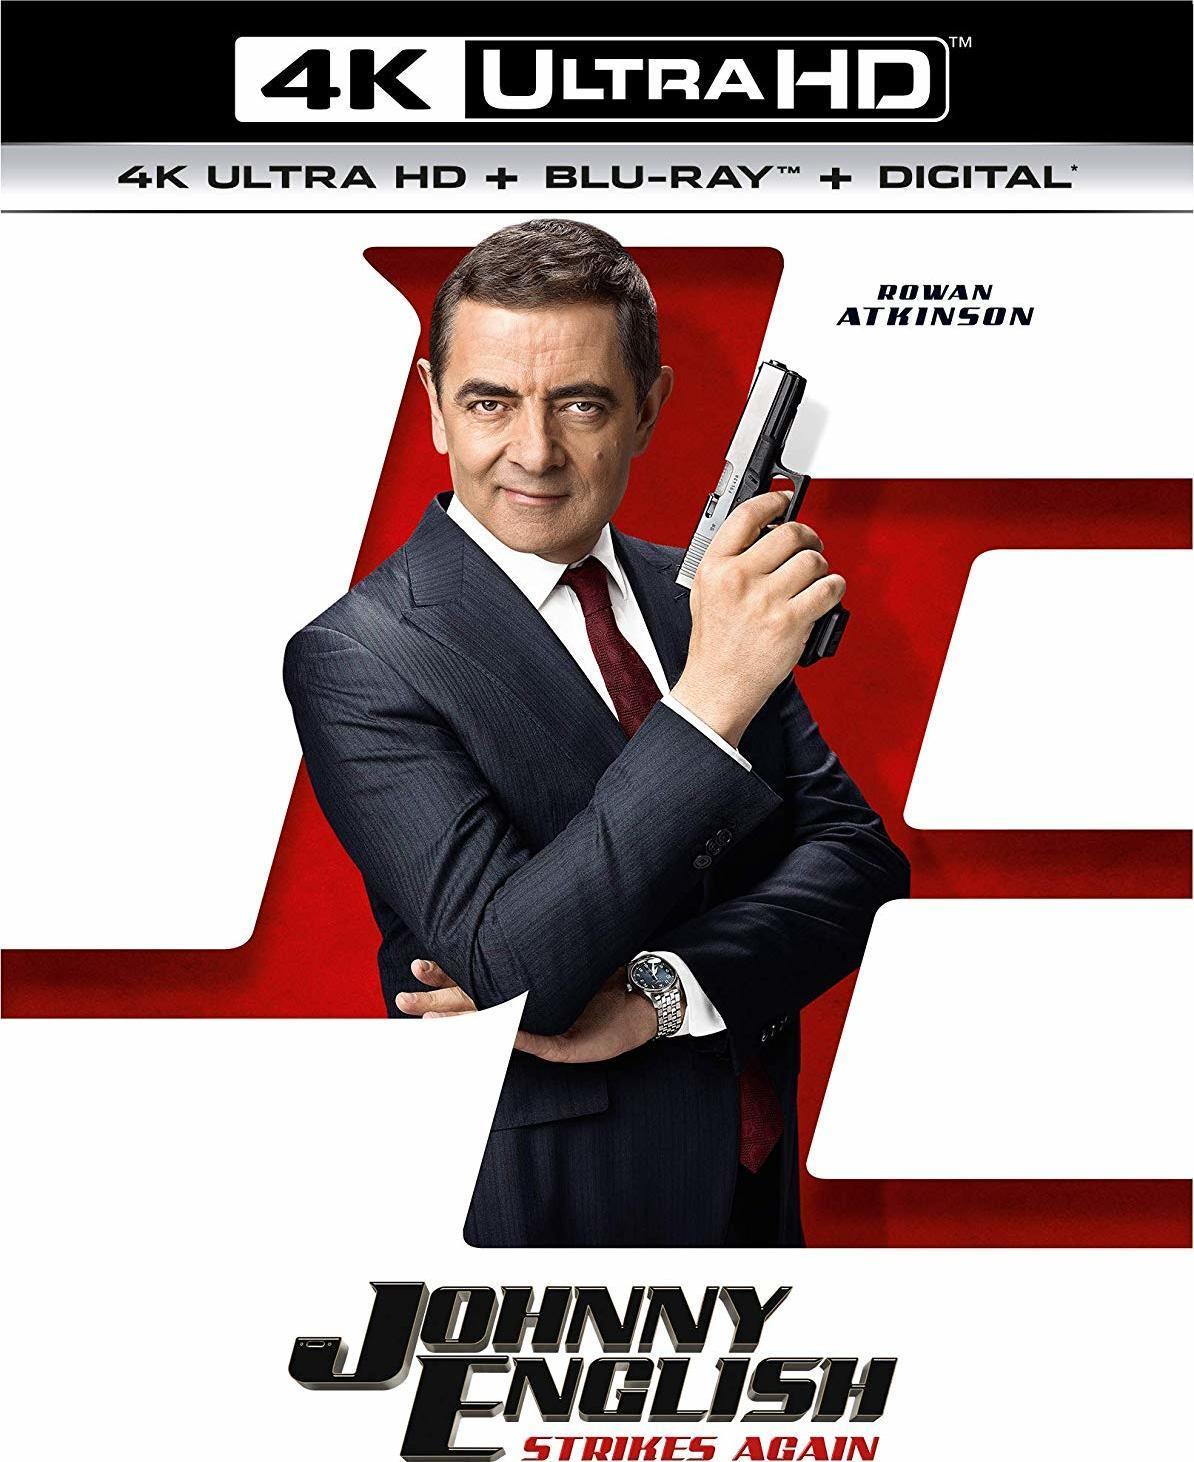 Johnny English Strikes Again (2018) poster image